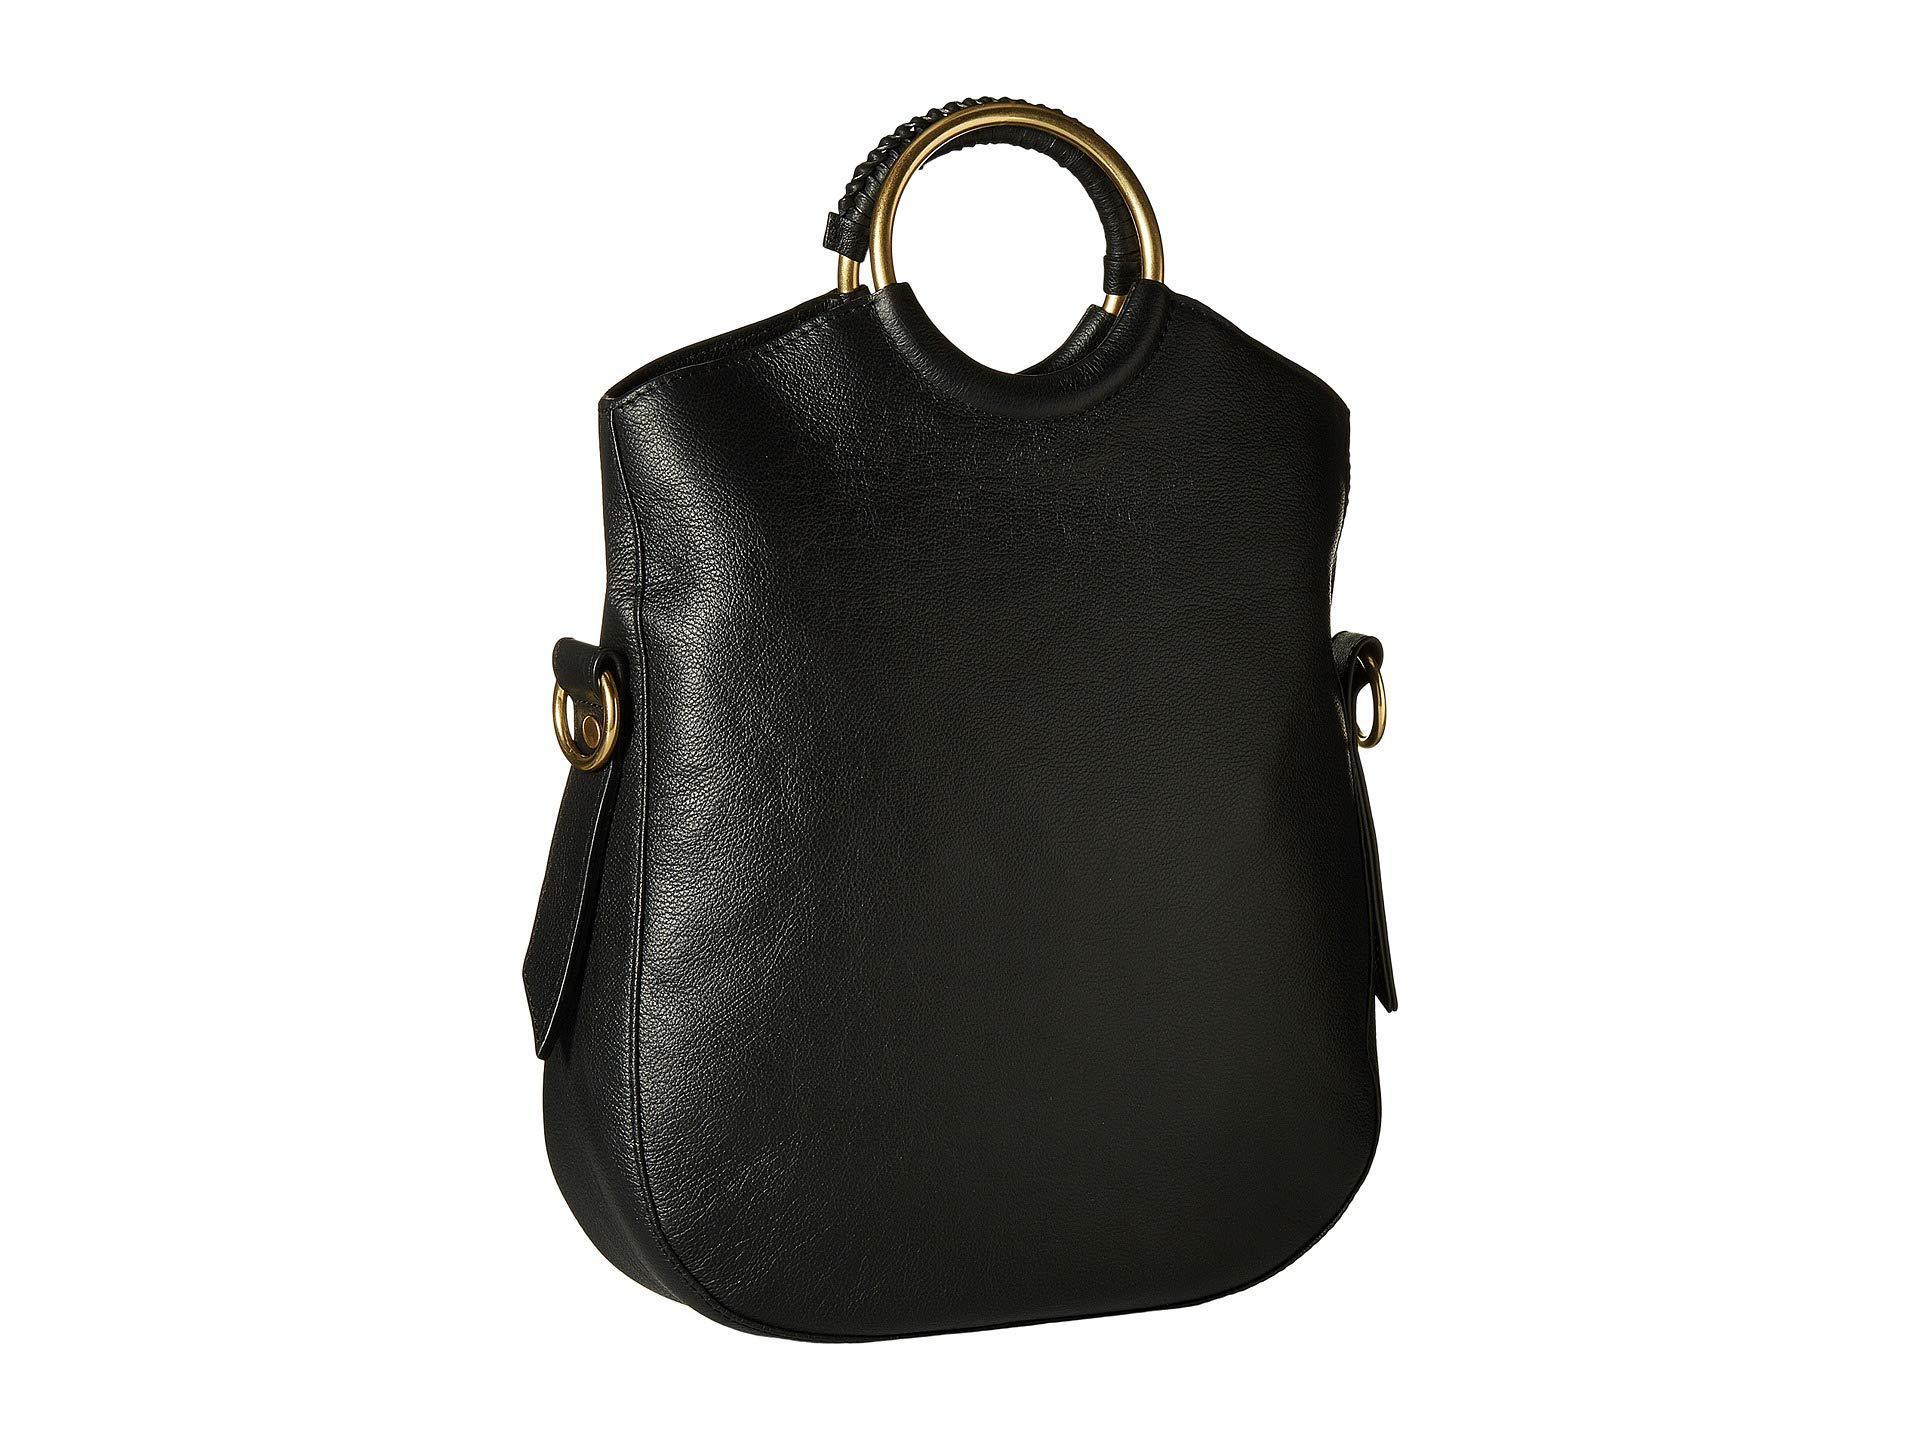 87a15580dd8 See By Chloé Monroe Large Bracelet Tote (black) Tote Handbags